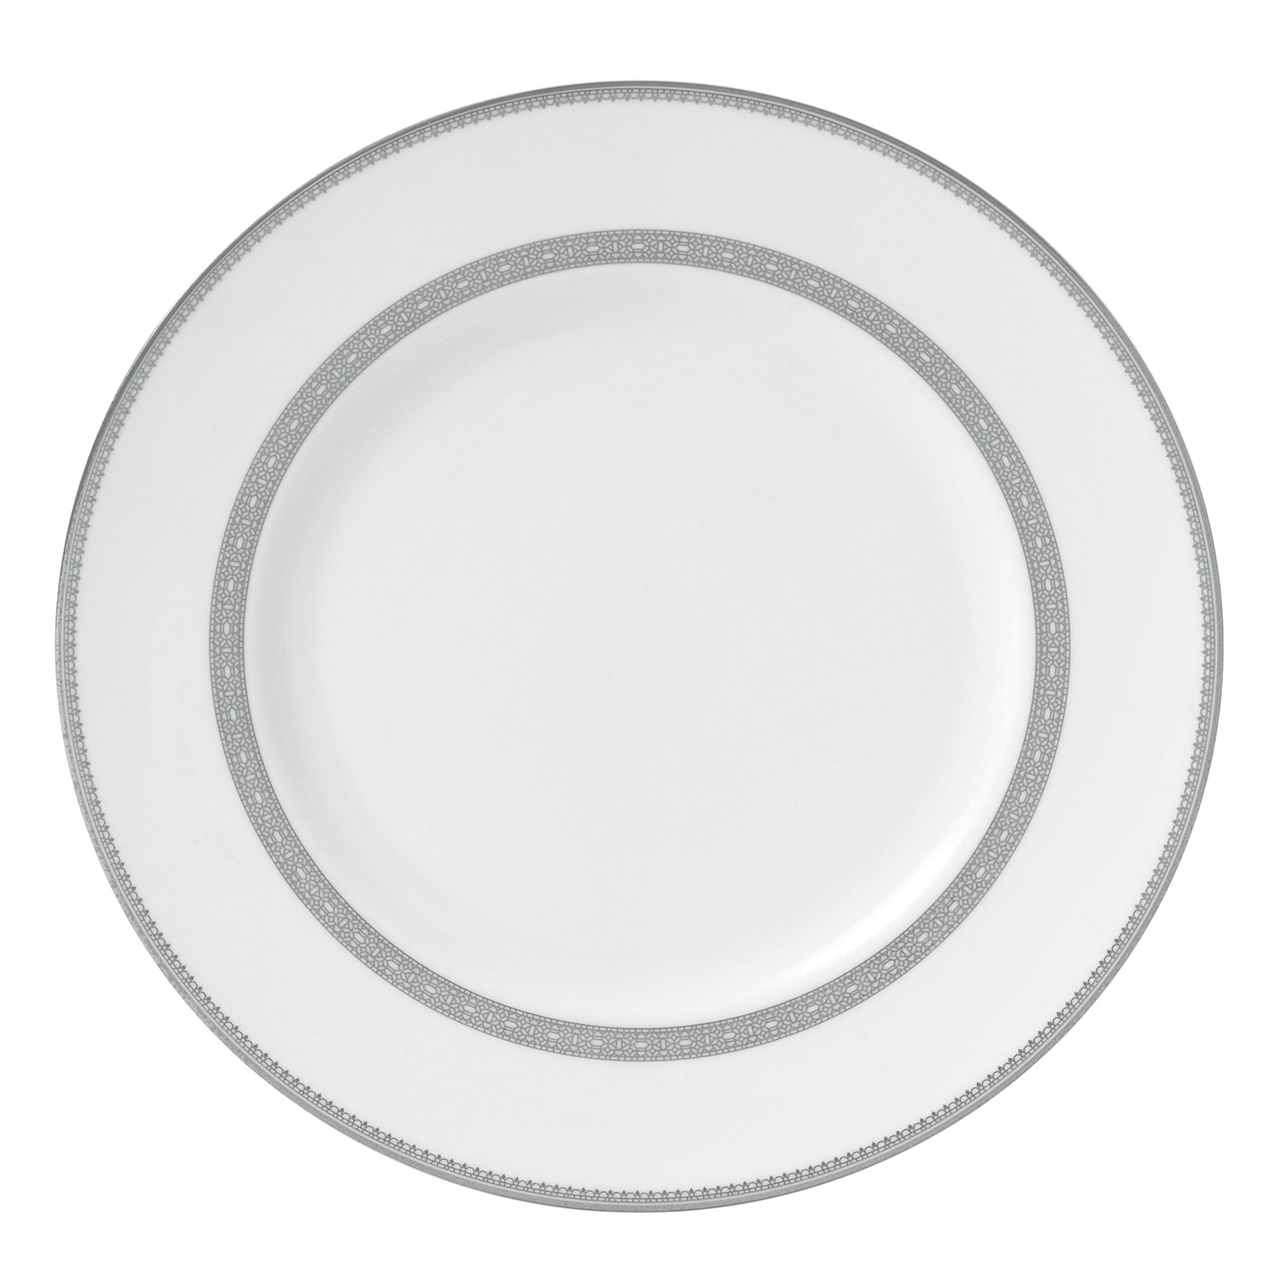 Vera Wang Lace Platinum Dinner Plate 27cm